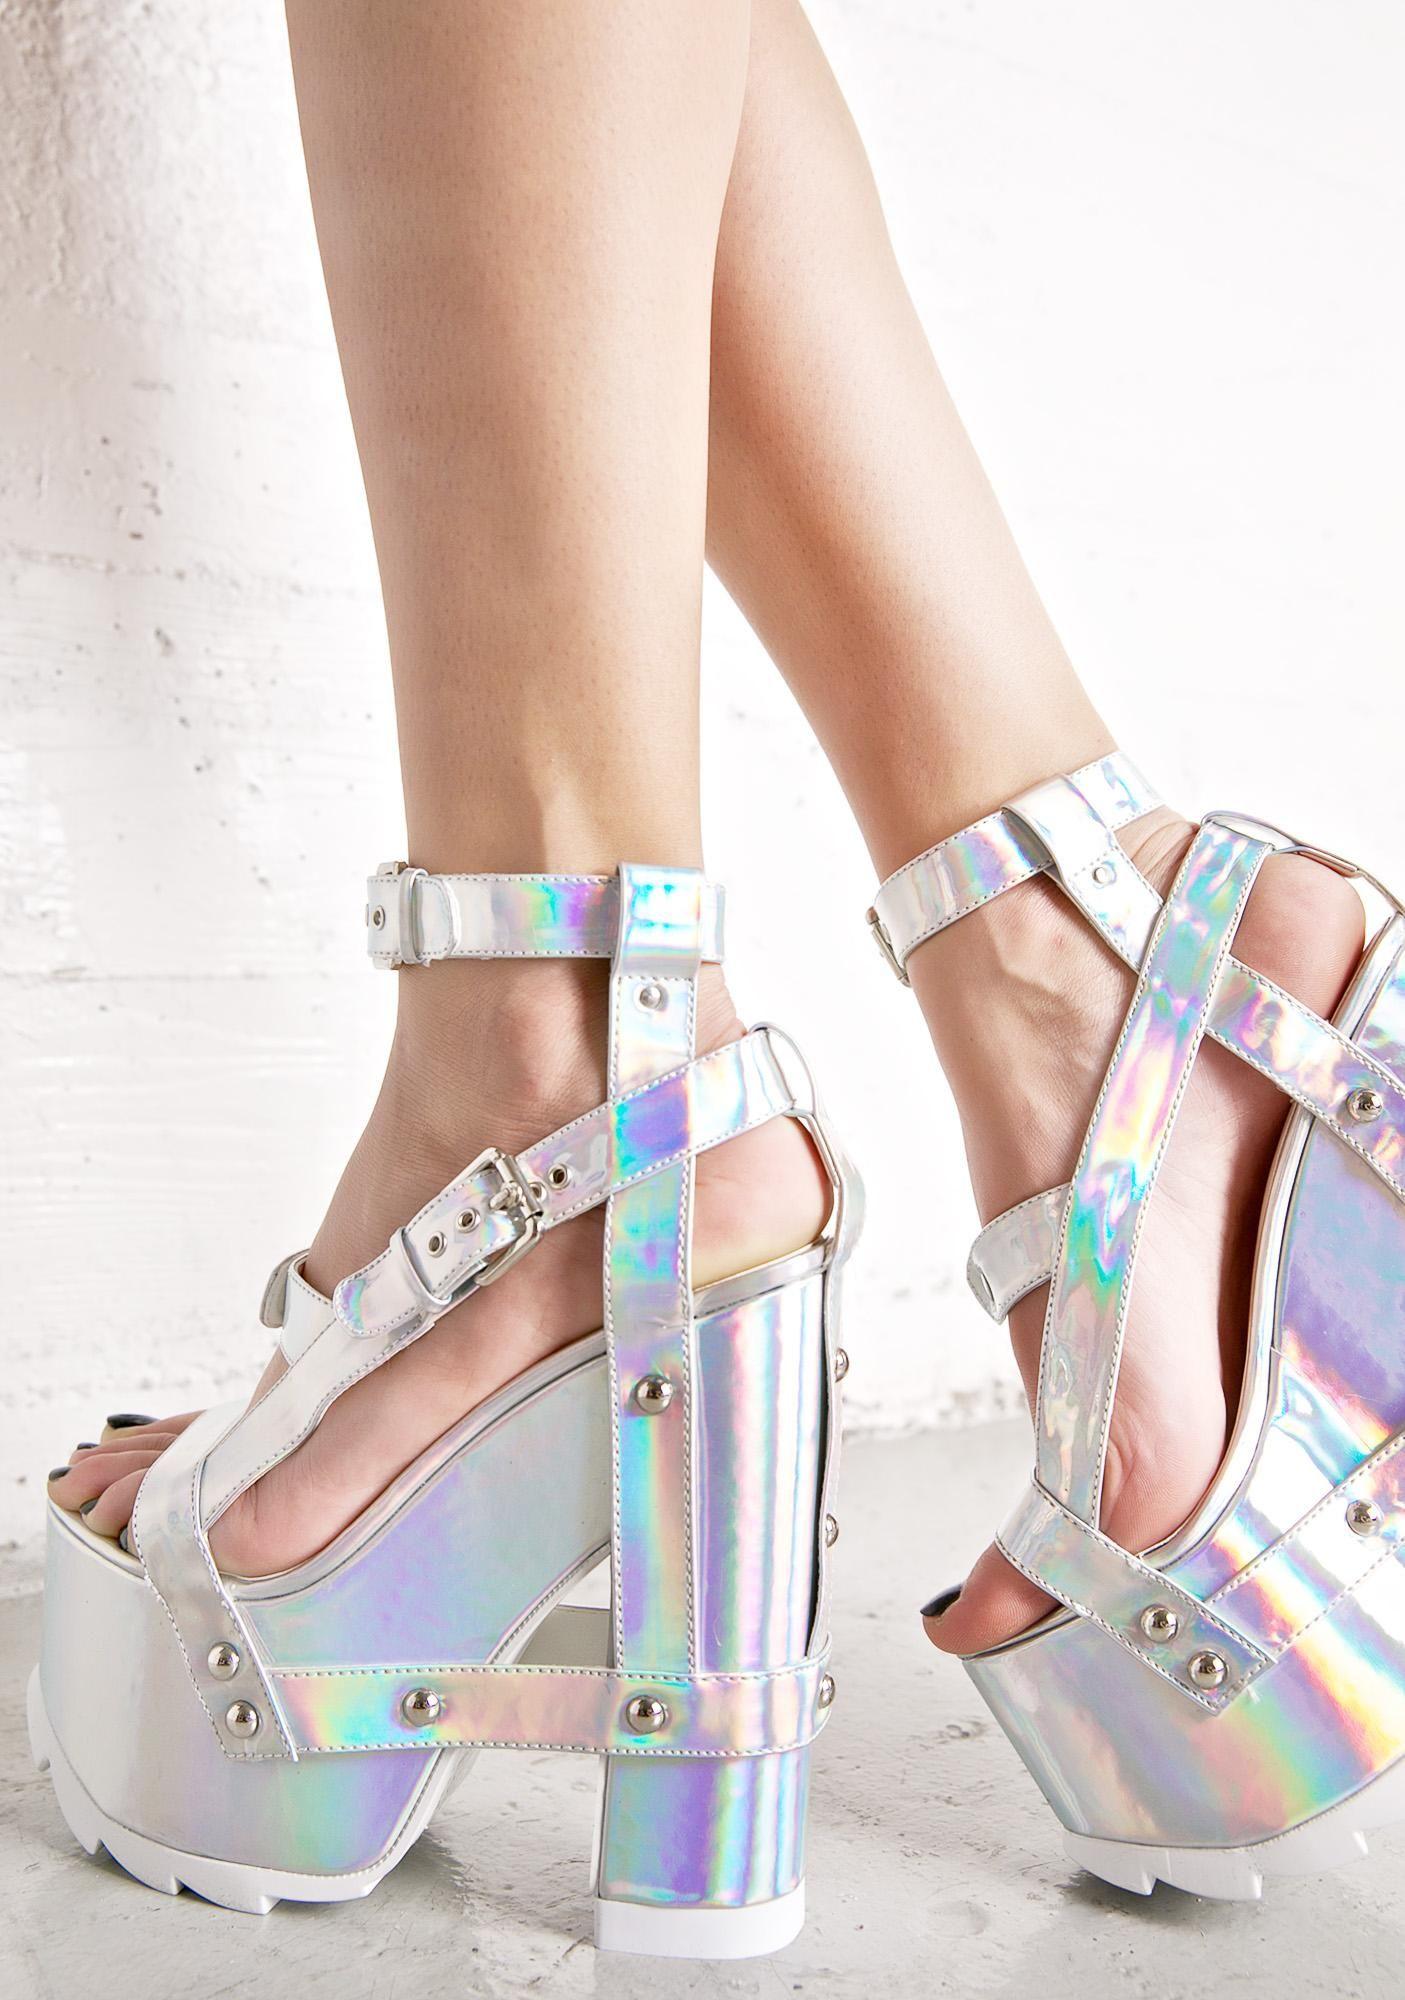 fb348685497 Holographic Nightcall Platform Heels in 2019 | 2 shoes | Heels ...